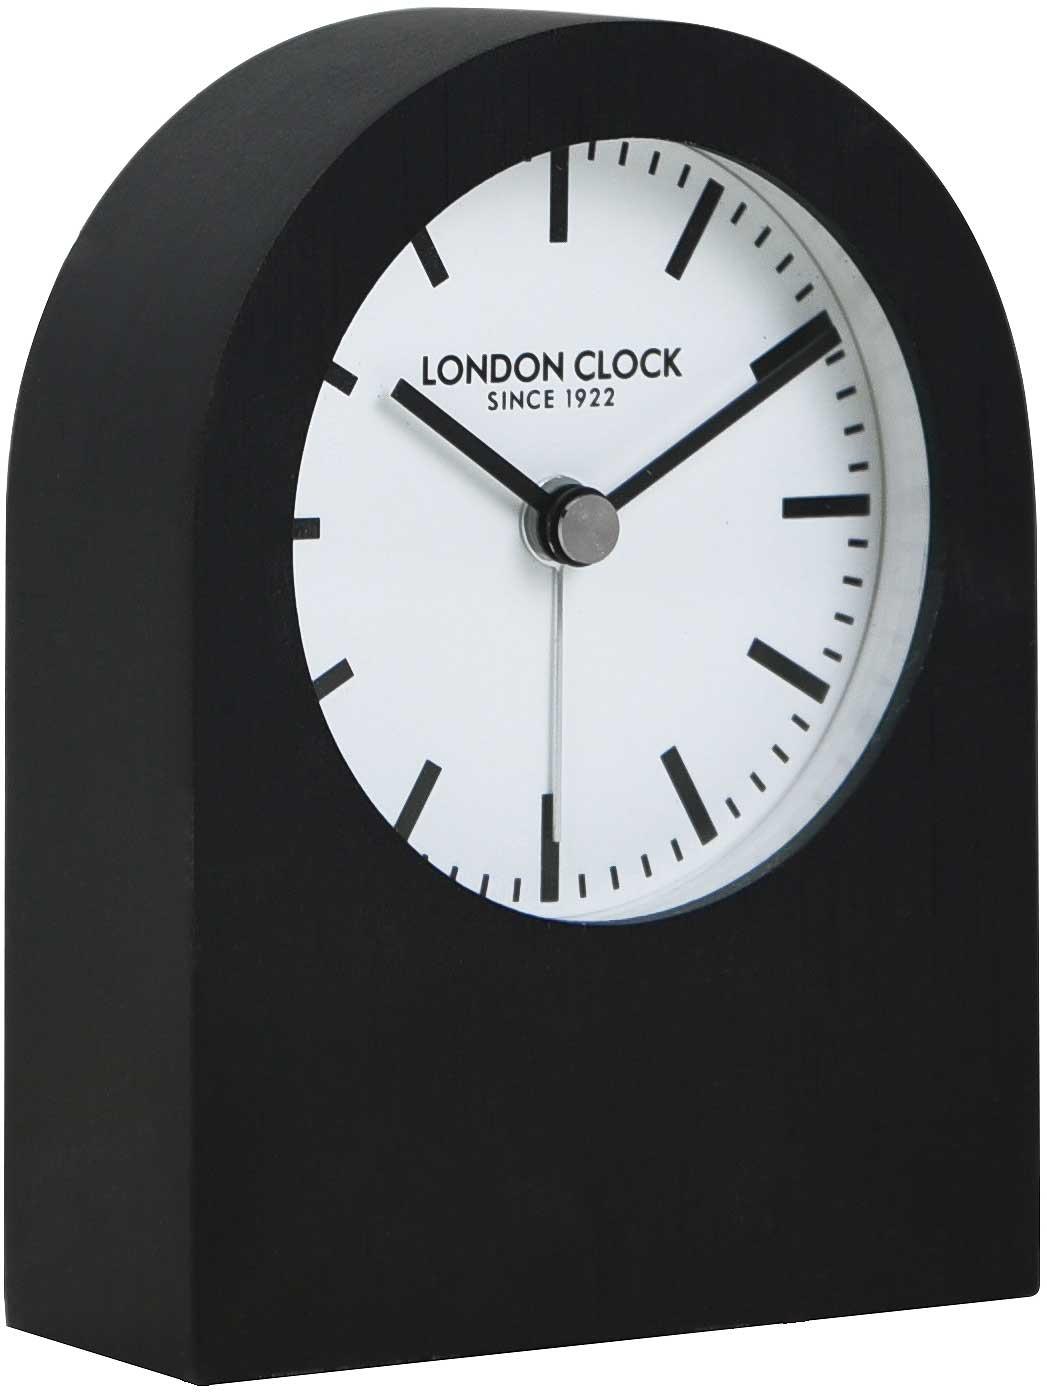 london clock 04165 horloge de table acier horloge de bureau nouveau ebay. Black Bedroom Furniture Sets. Home Design Ideas